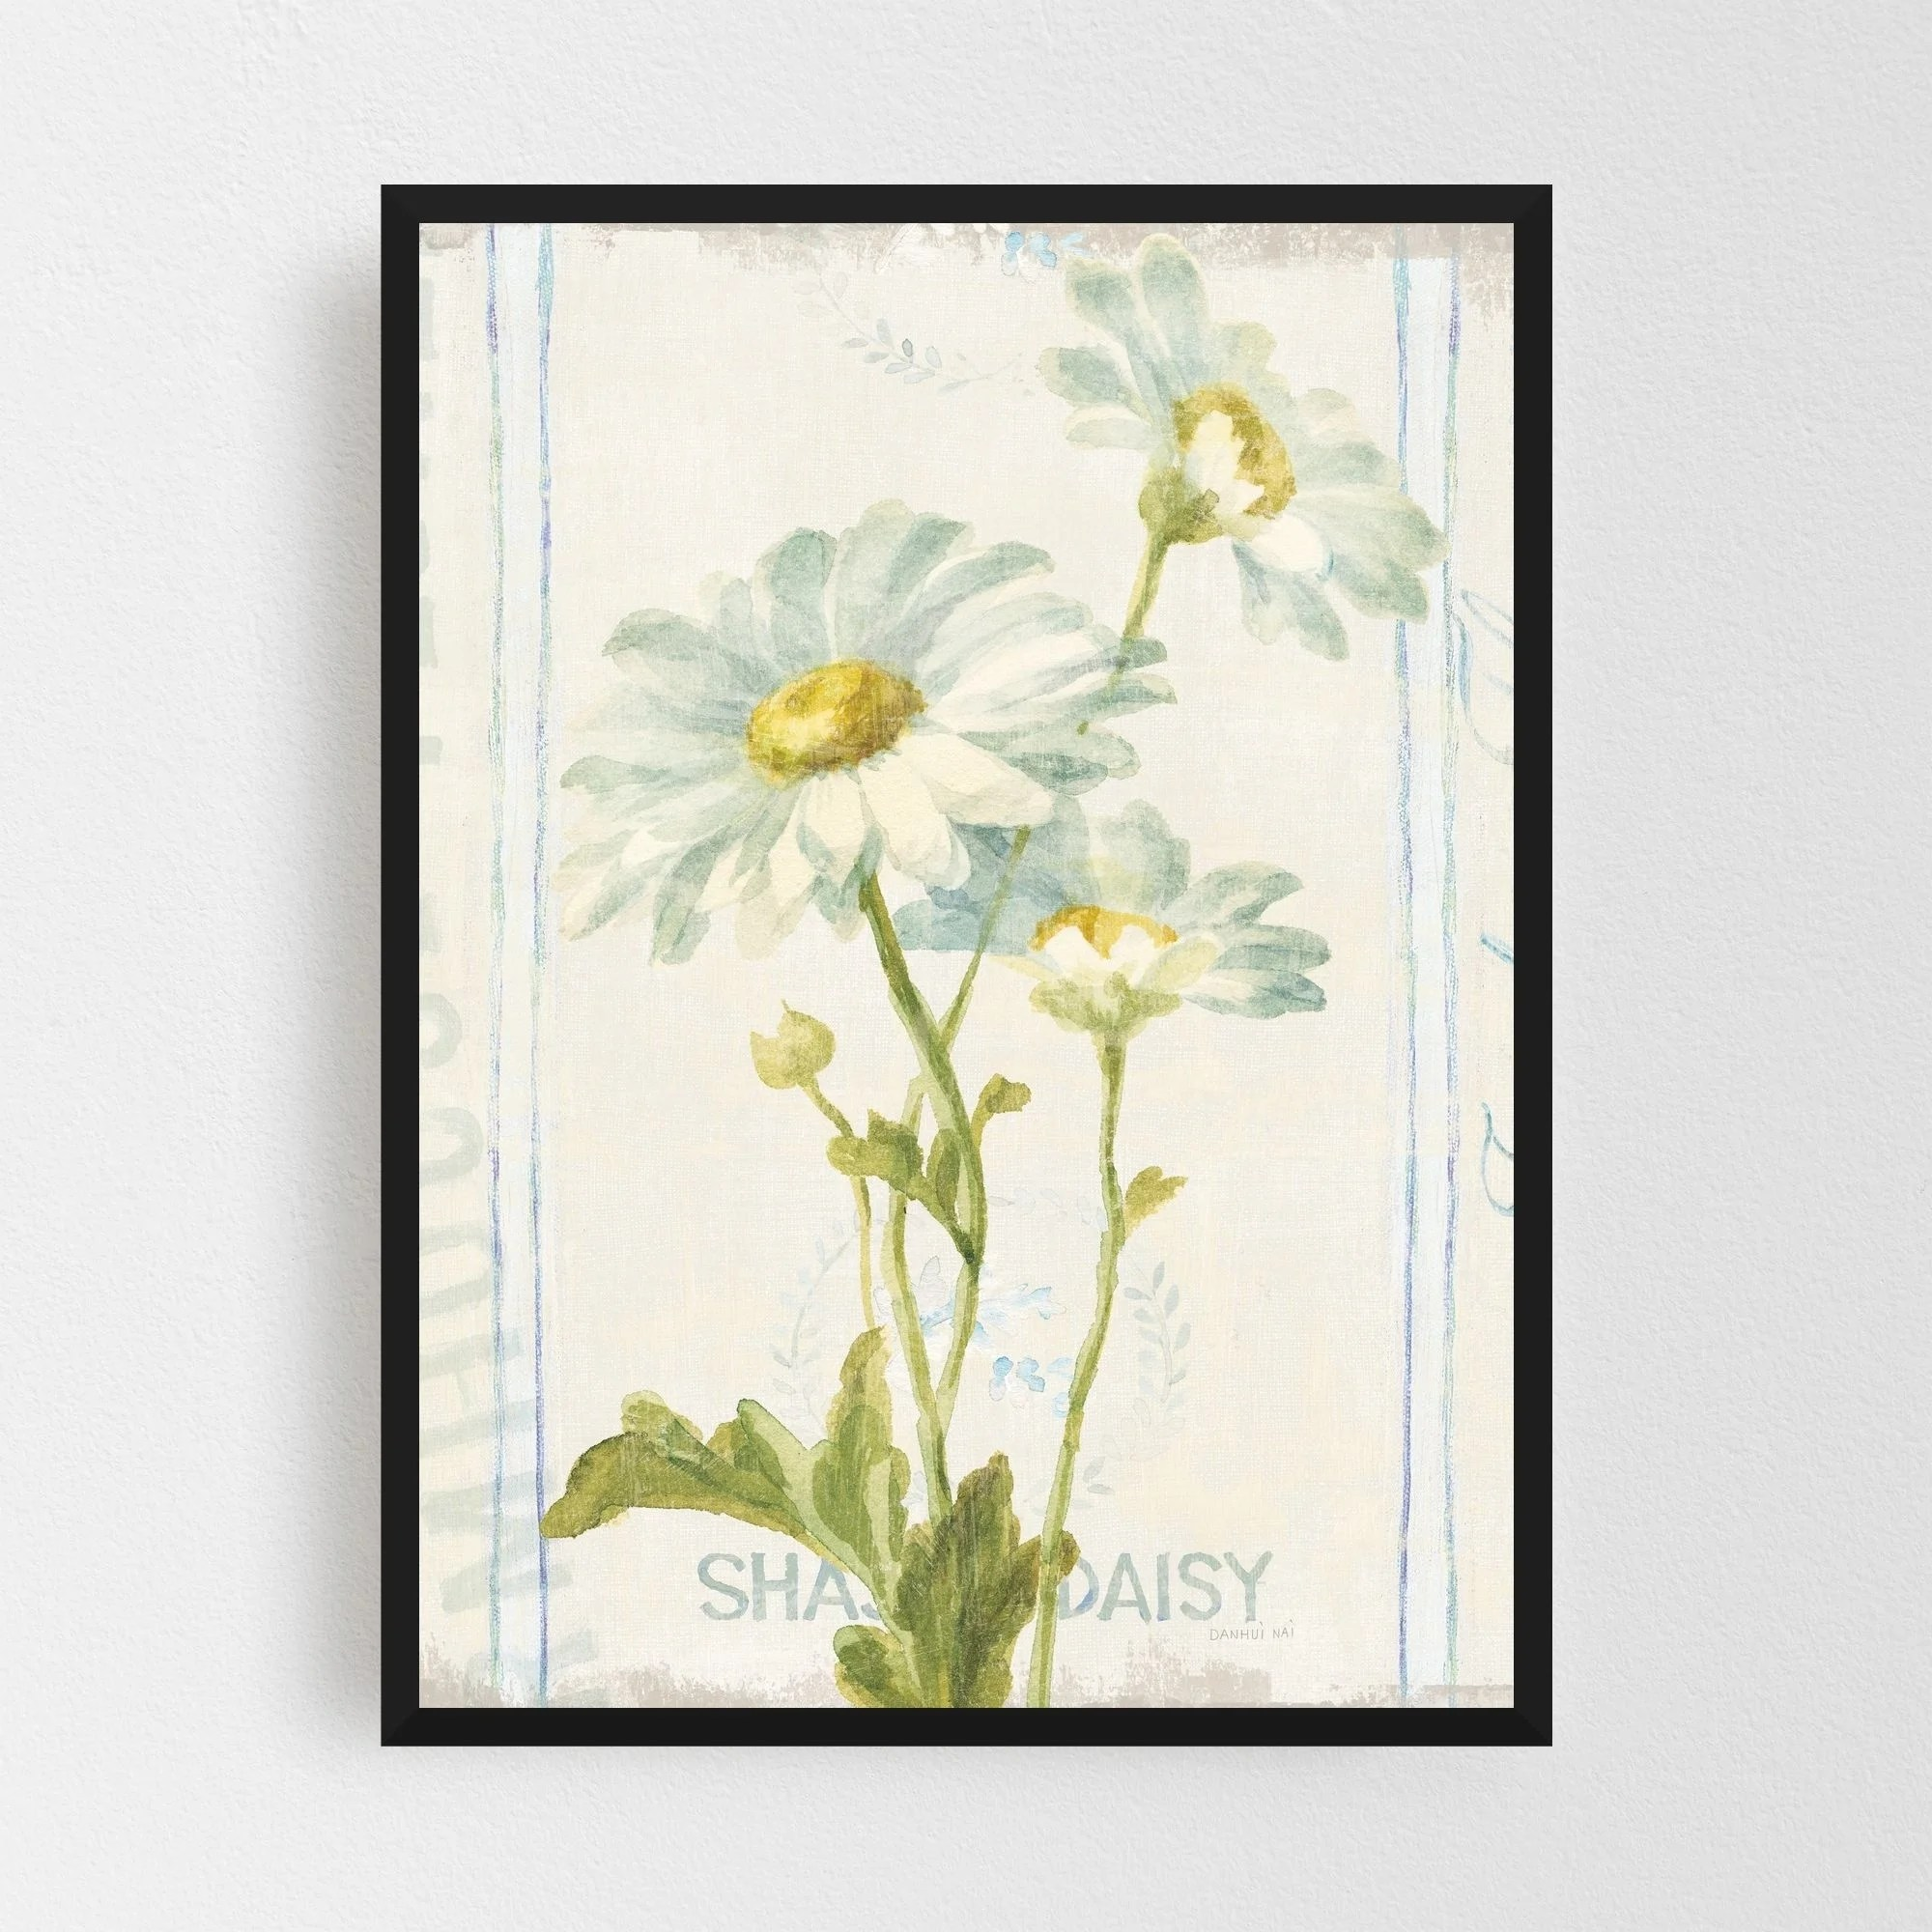 Noir Gallery Rural Floral Daisy Typography Framed Art Print